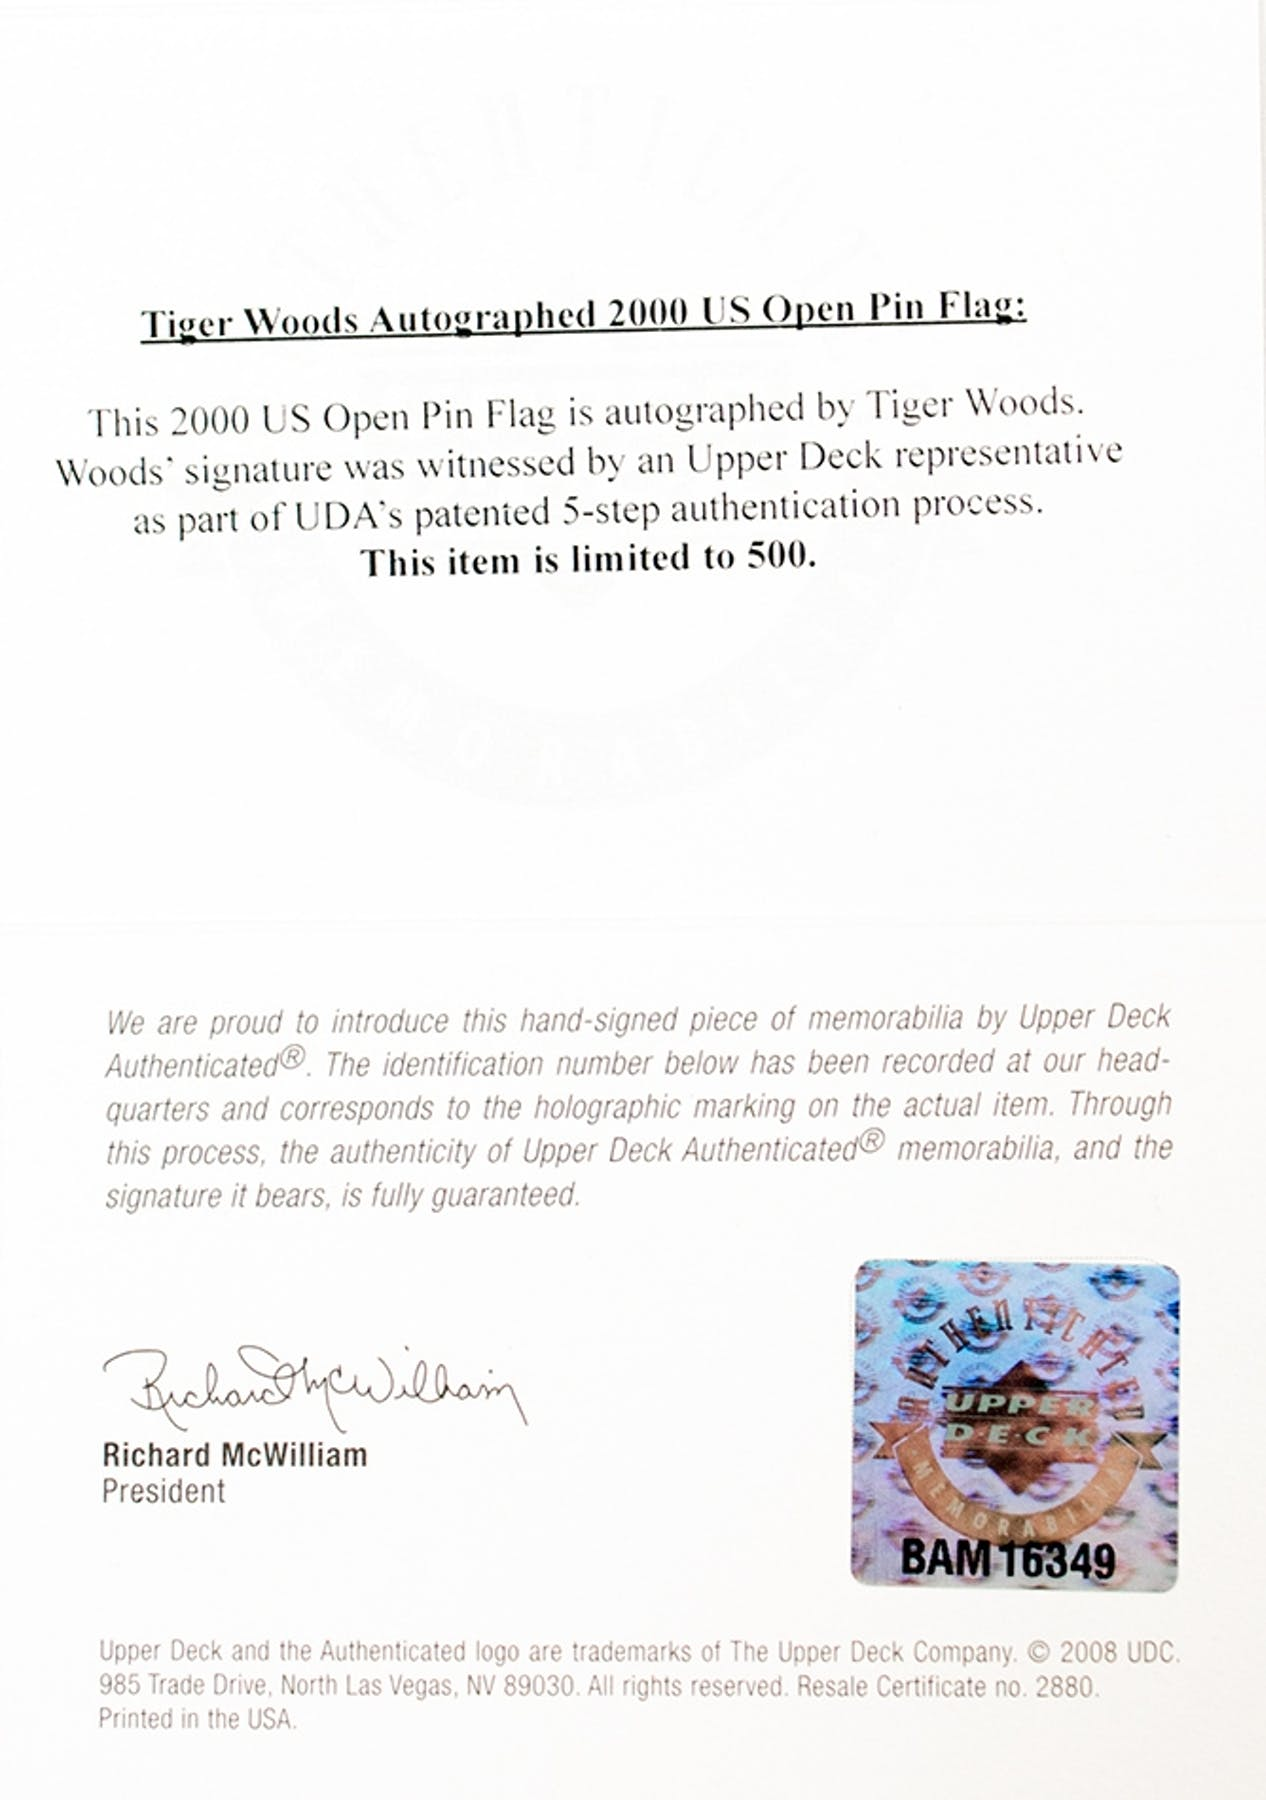 Tiger woods autographed us open pebble beach pin flag 180500 tiger woods autographed us open pebble beach pin flag 180500 upper deck xflitez Choice Image